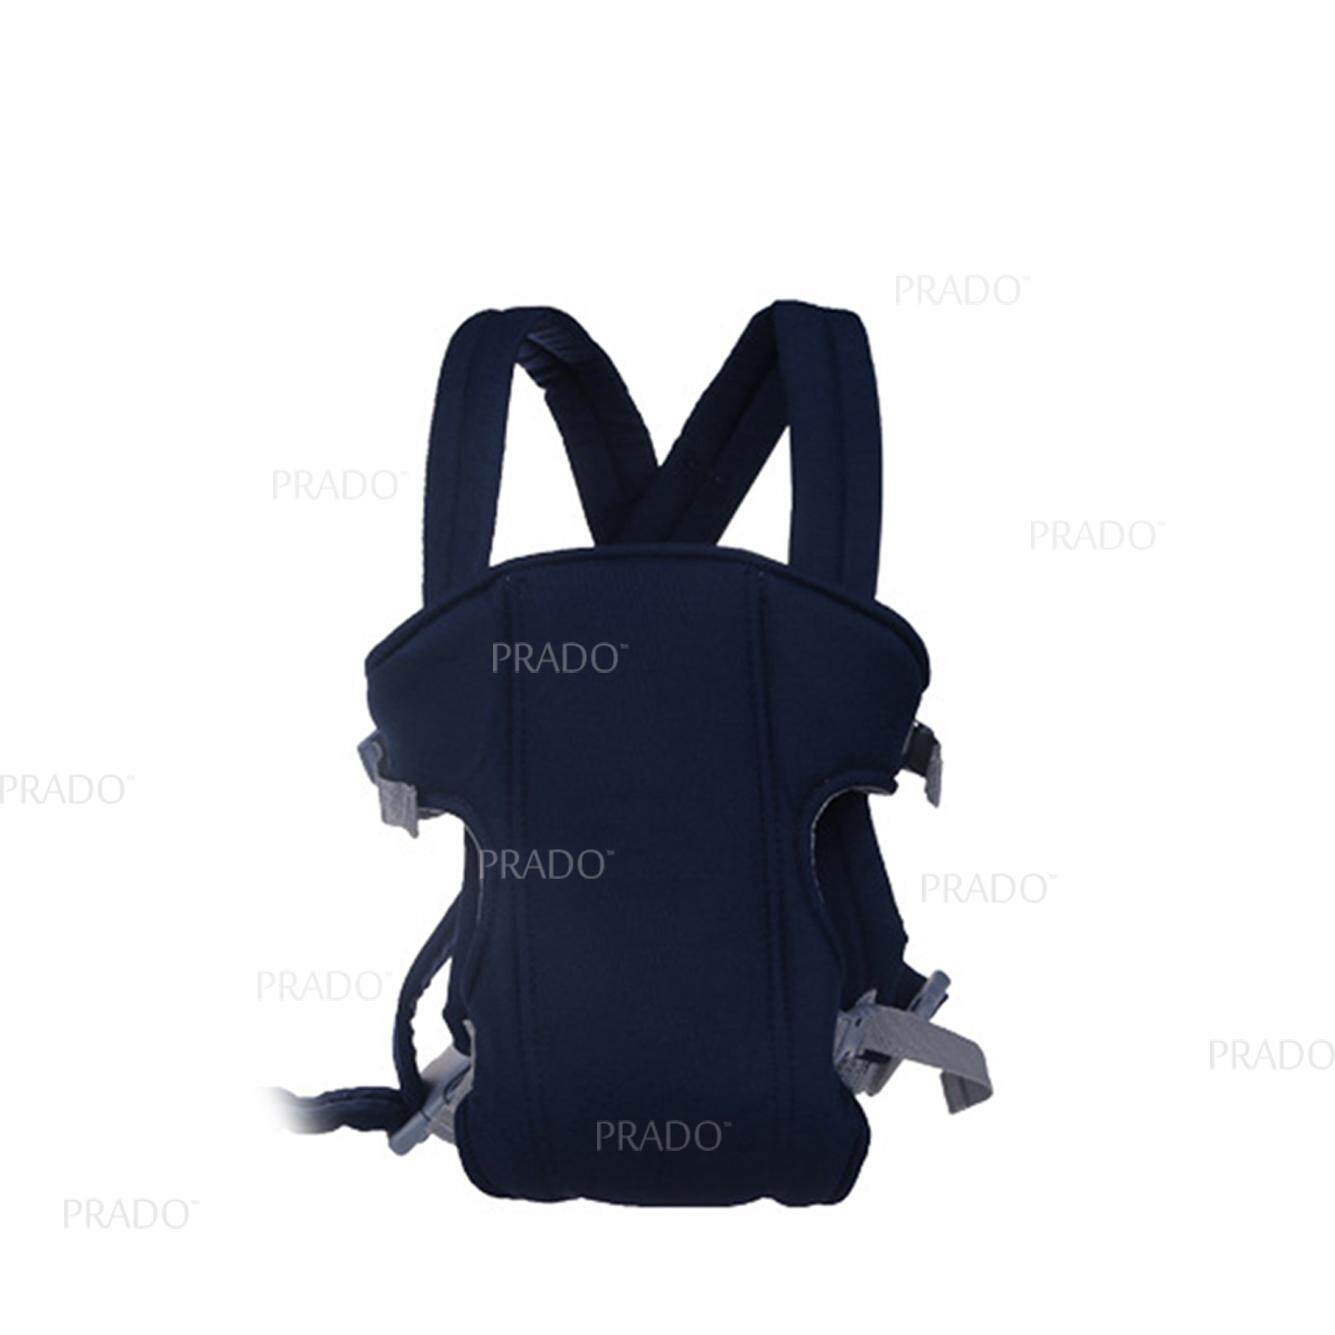 PRADO Malaysia Cross Back Baby Carrier Bag 1088 Front Breathable Infant Backpack TKB-BAG-1088-DB